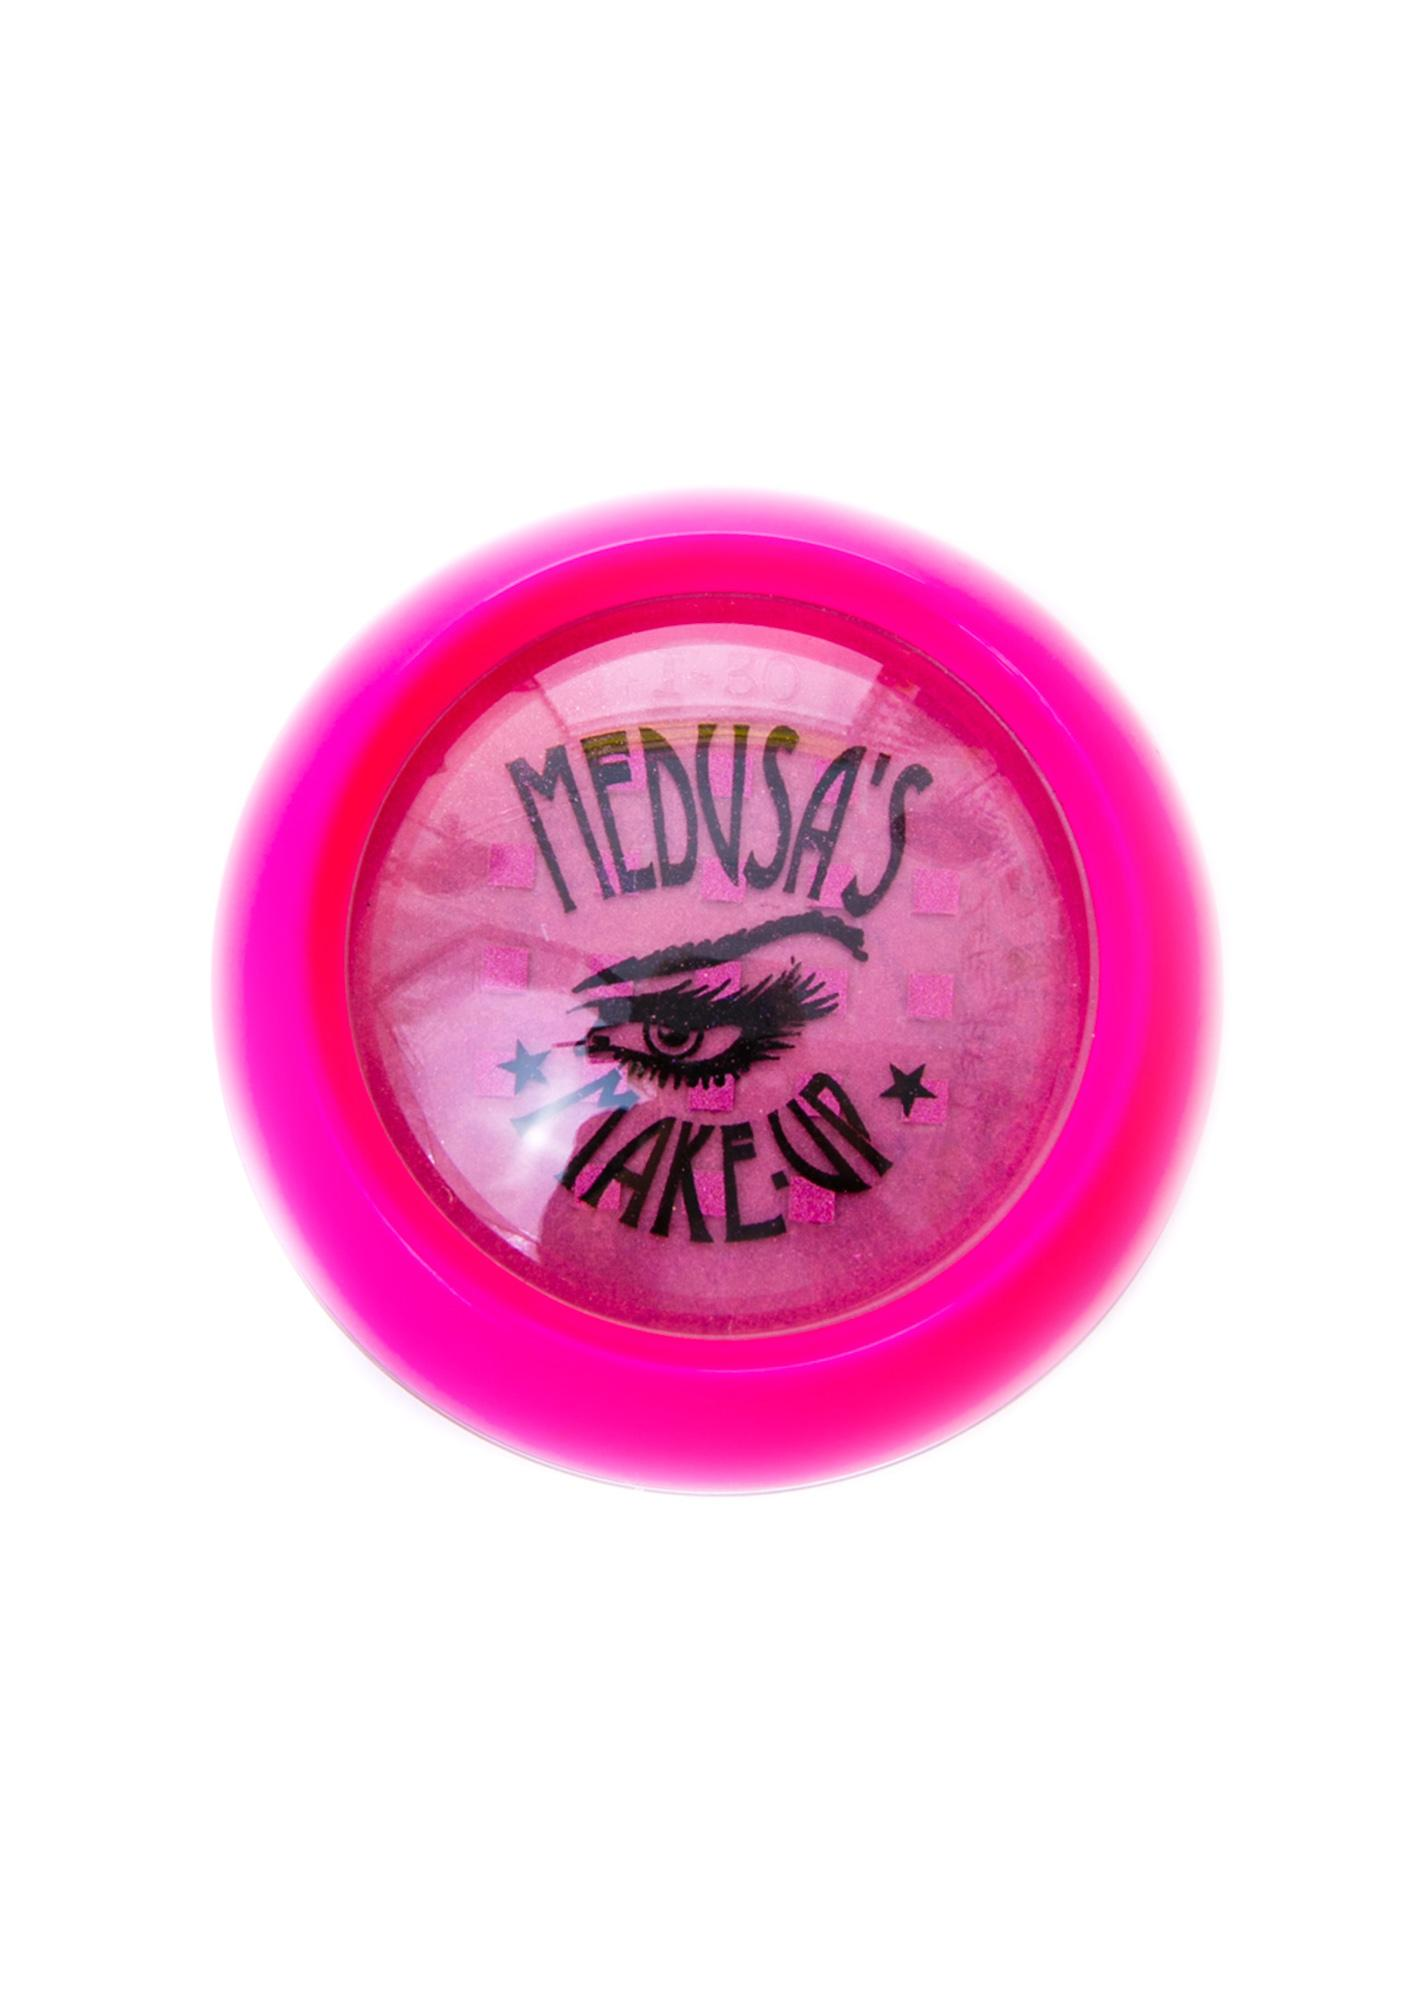 Medusa's Makeup Blush